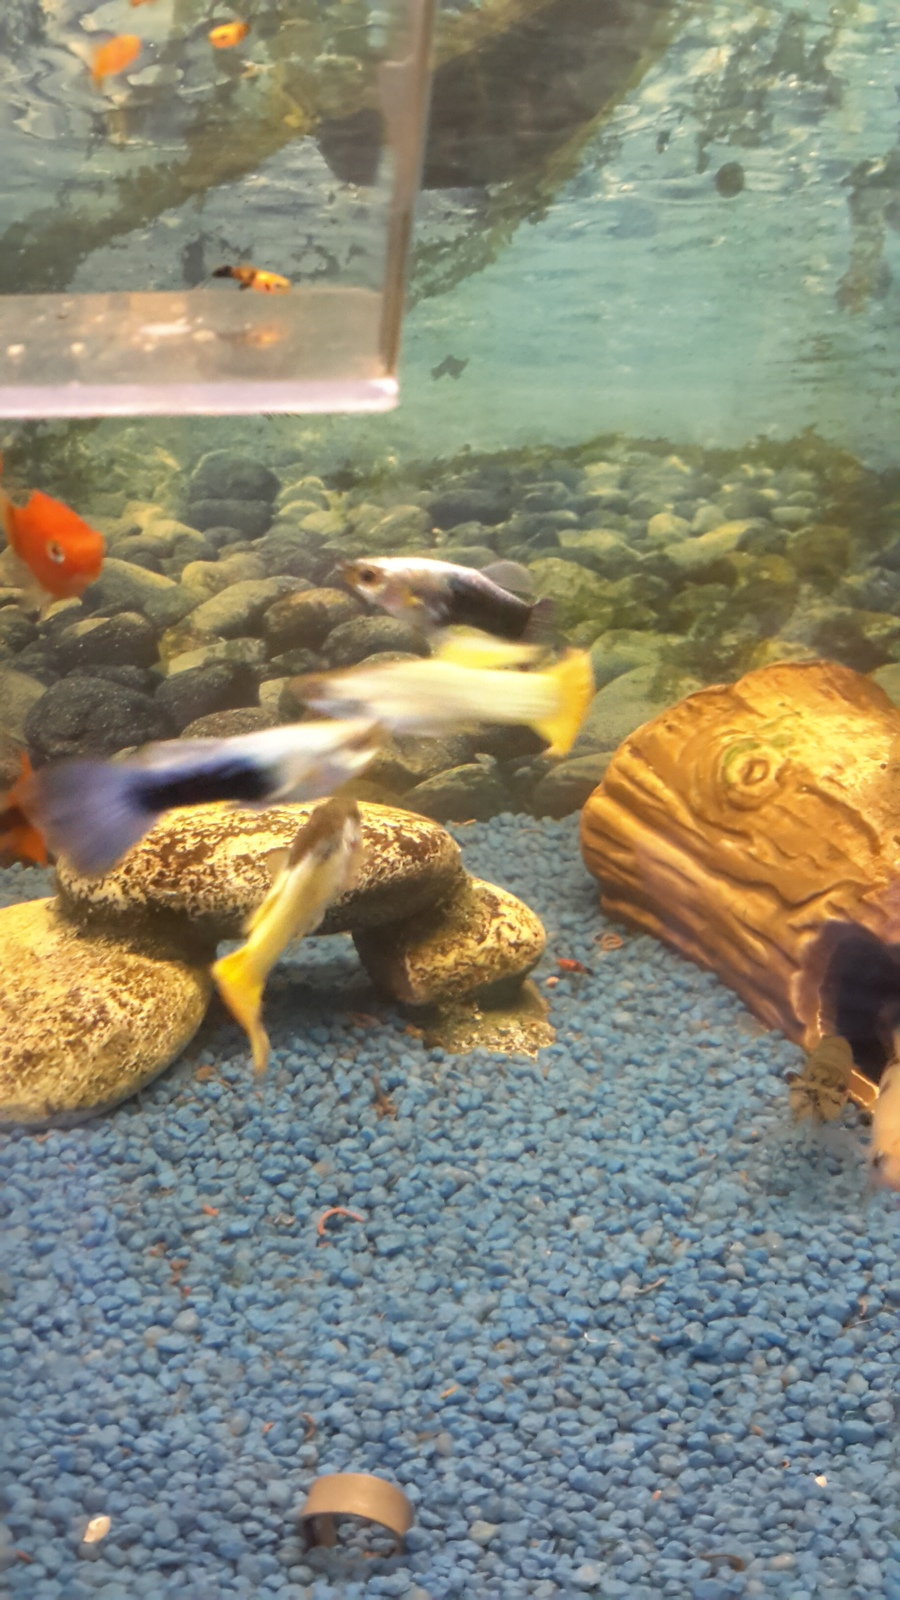 When Do Male Guppy Fry Get Their Colors? | My Aquarium Club